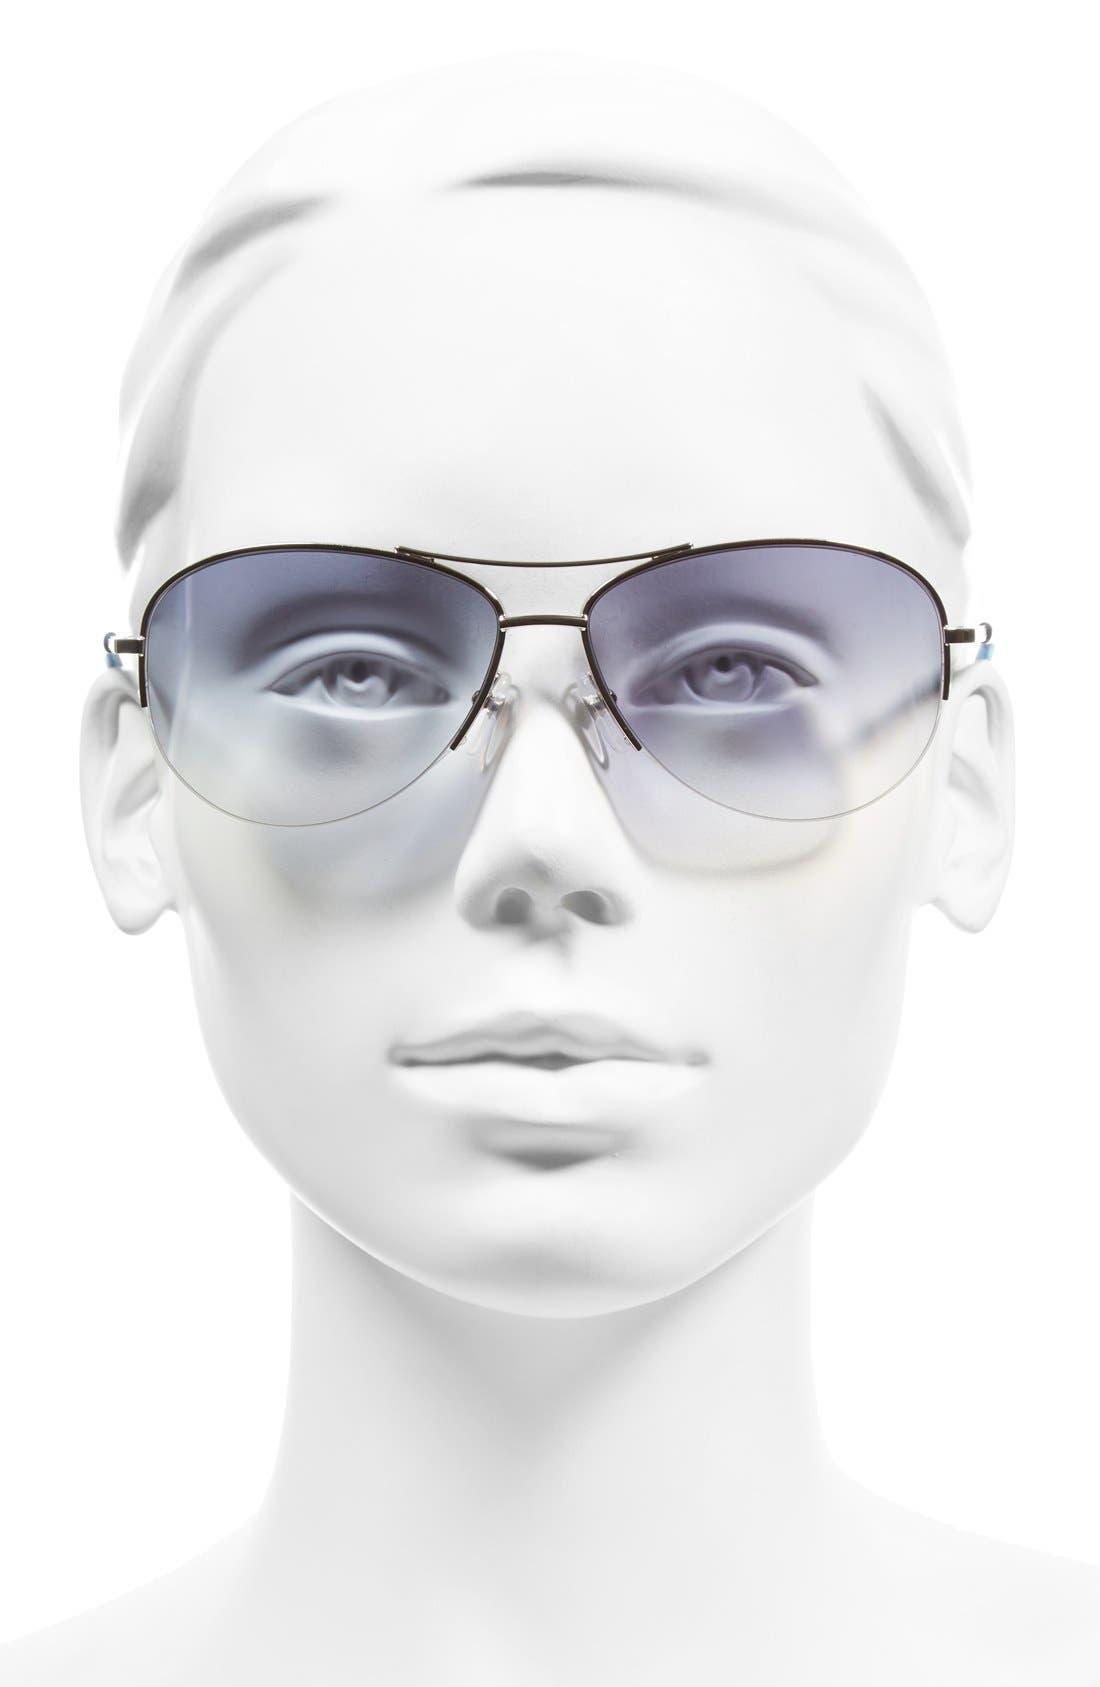 59mm Semi Rimless Sunglasses,                             Alternate thumbnail 2, color,                             PALLADIUM